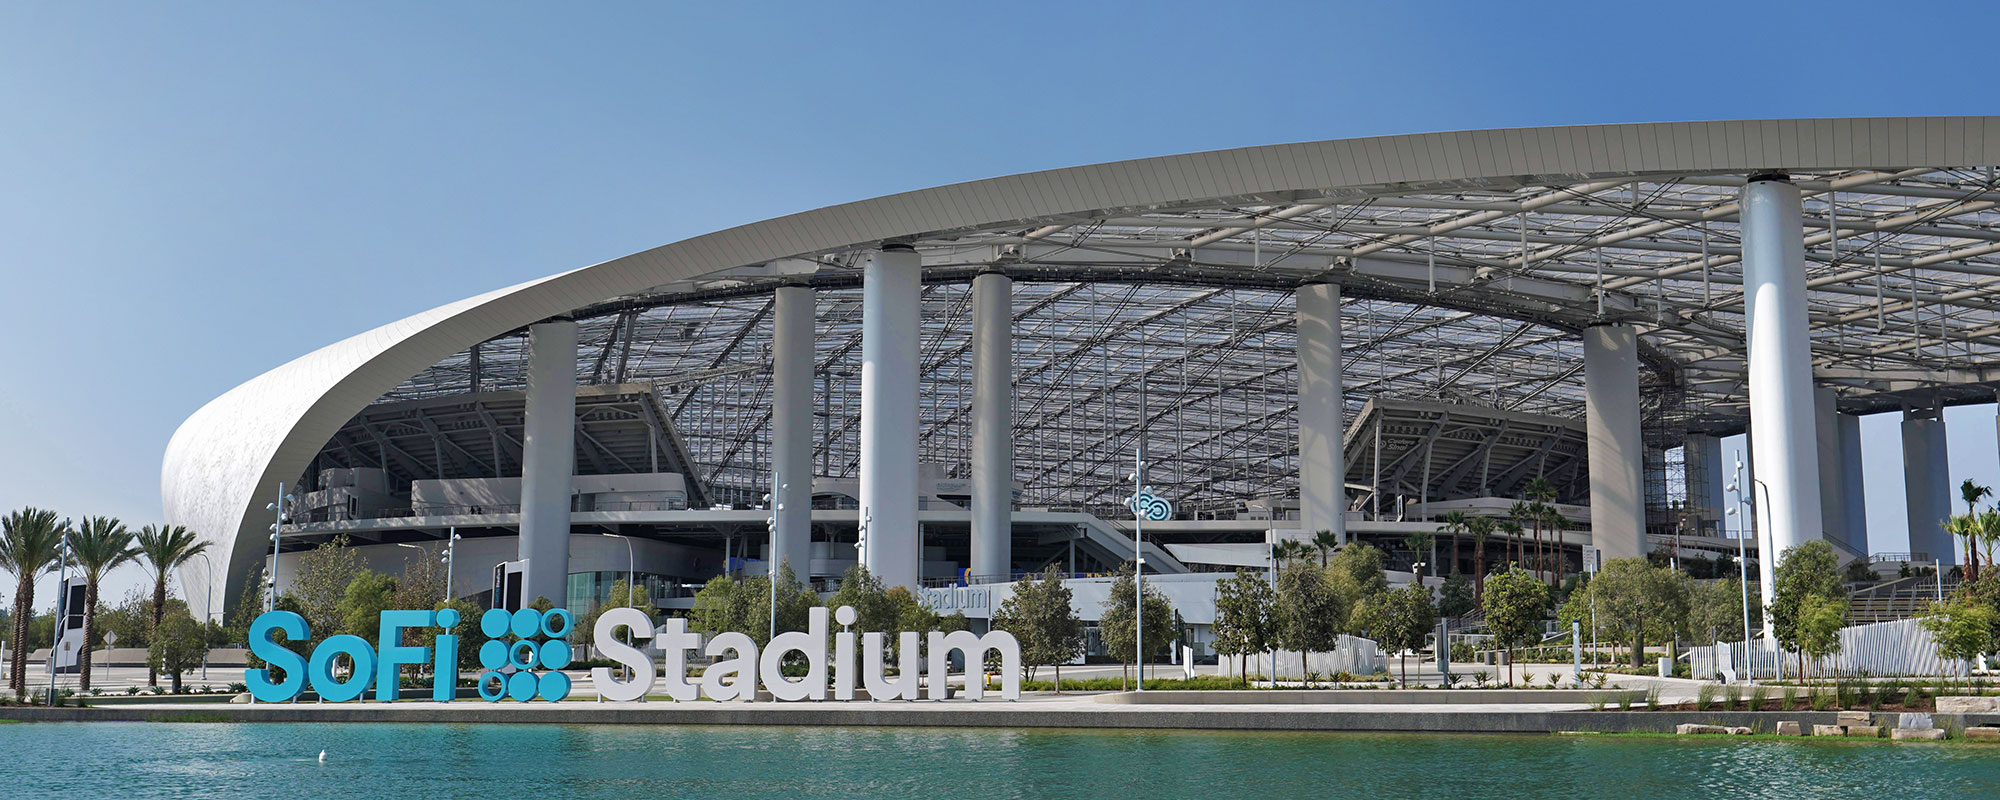 SoFi Stadium Los Angeles Stadium at Hollywood Park FabriTec Structures ETFE roof